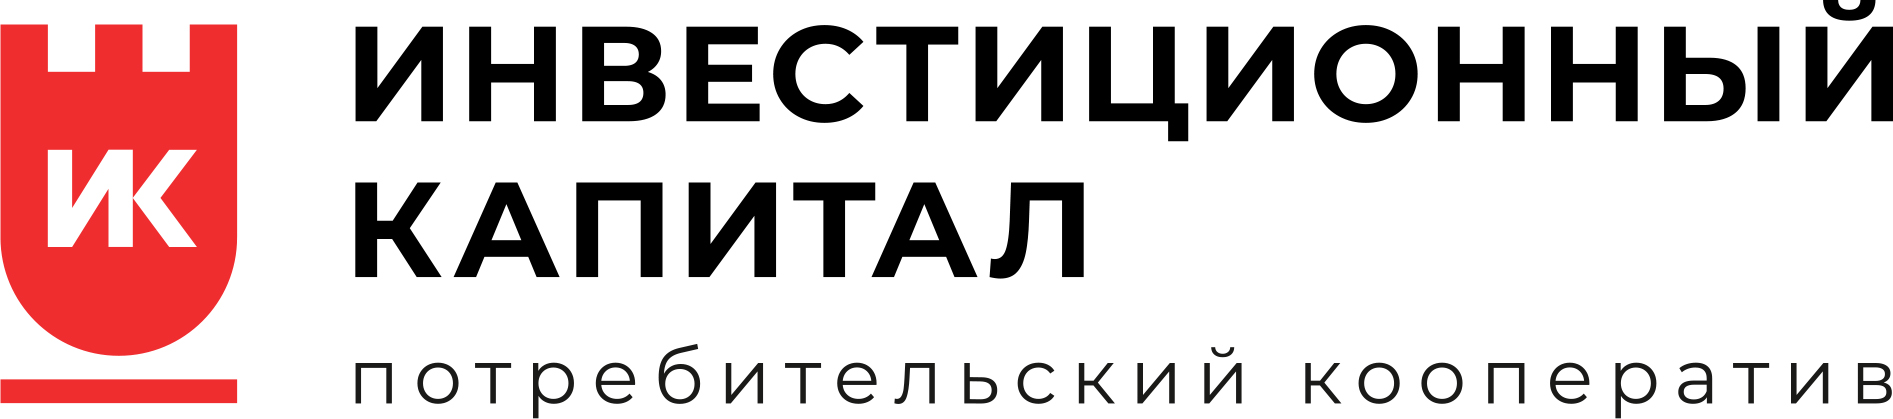 "ПК ""ИНВЕСТИЦИОННЫЙ КАПИТАЛ"""